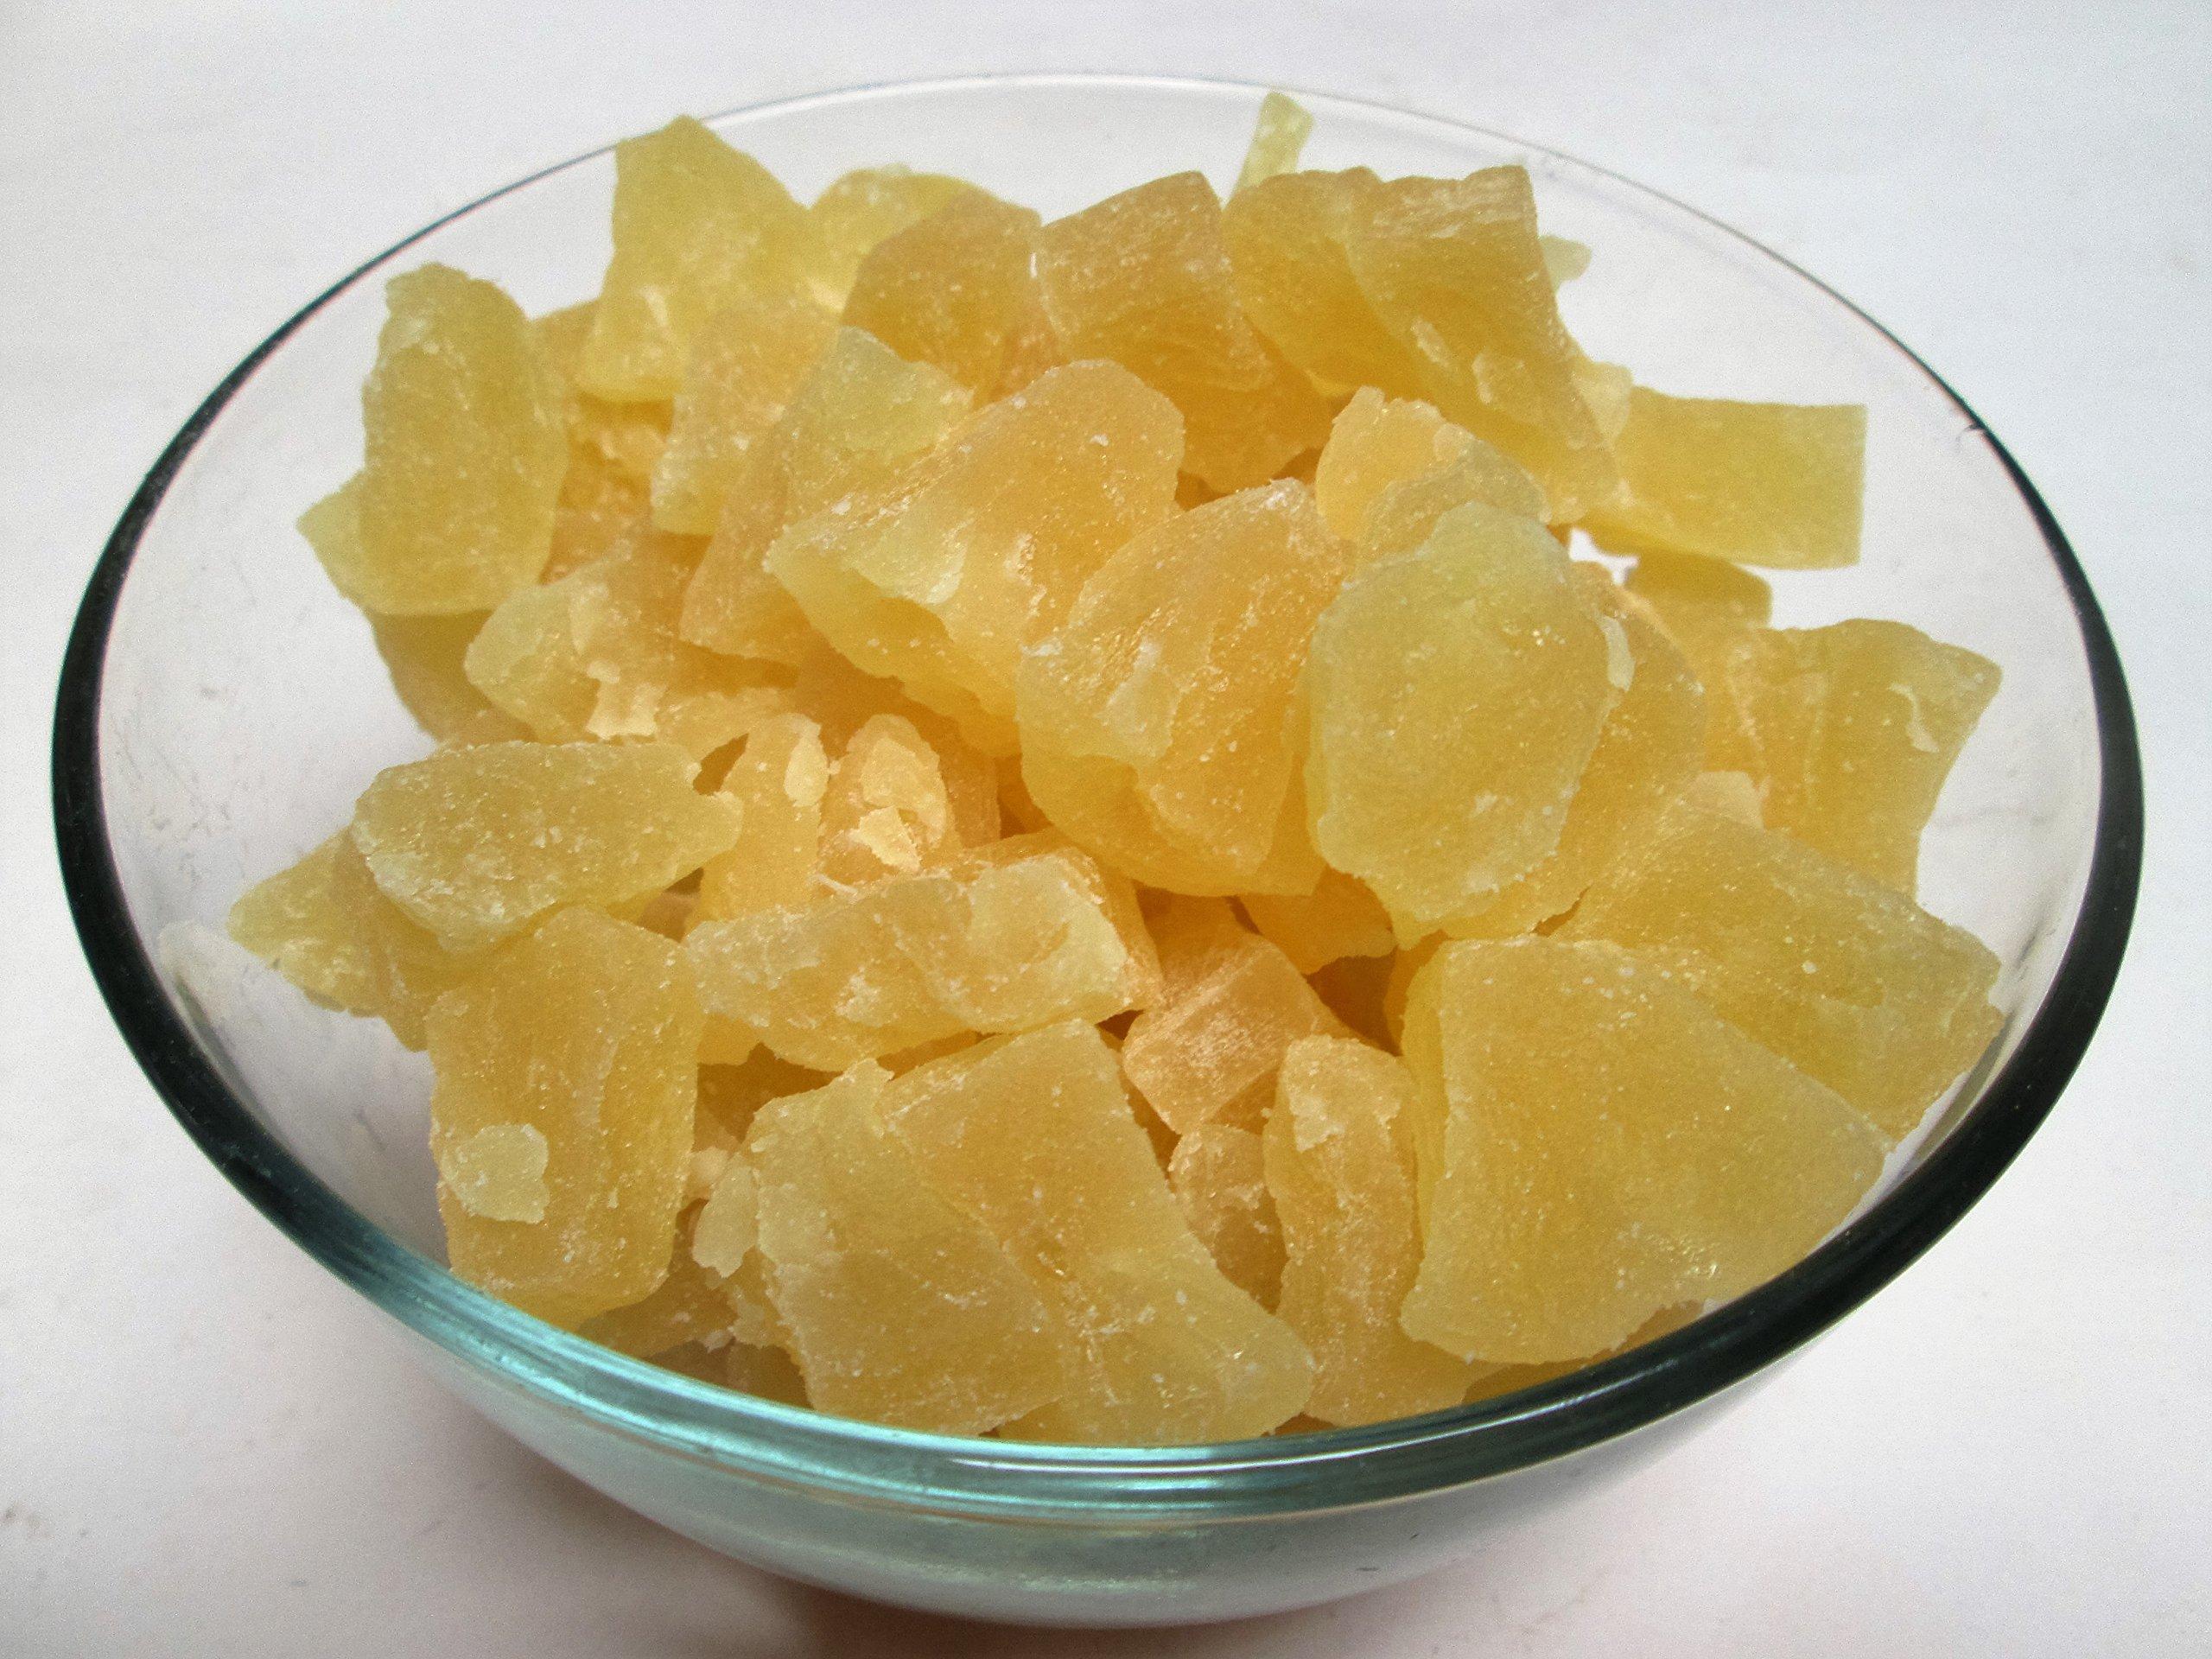 Dried Pineapple Chunks ( Tidbits ) 3 lb bag by CandyMax